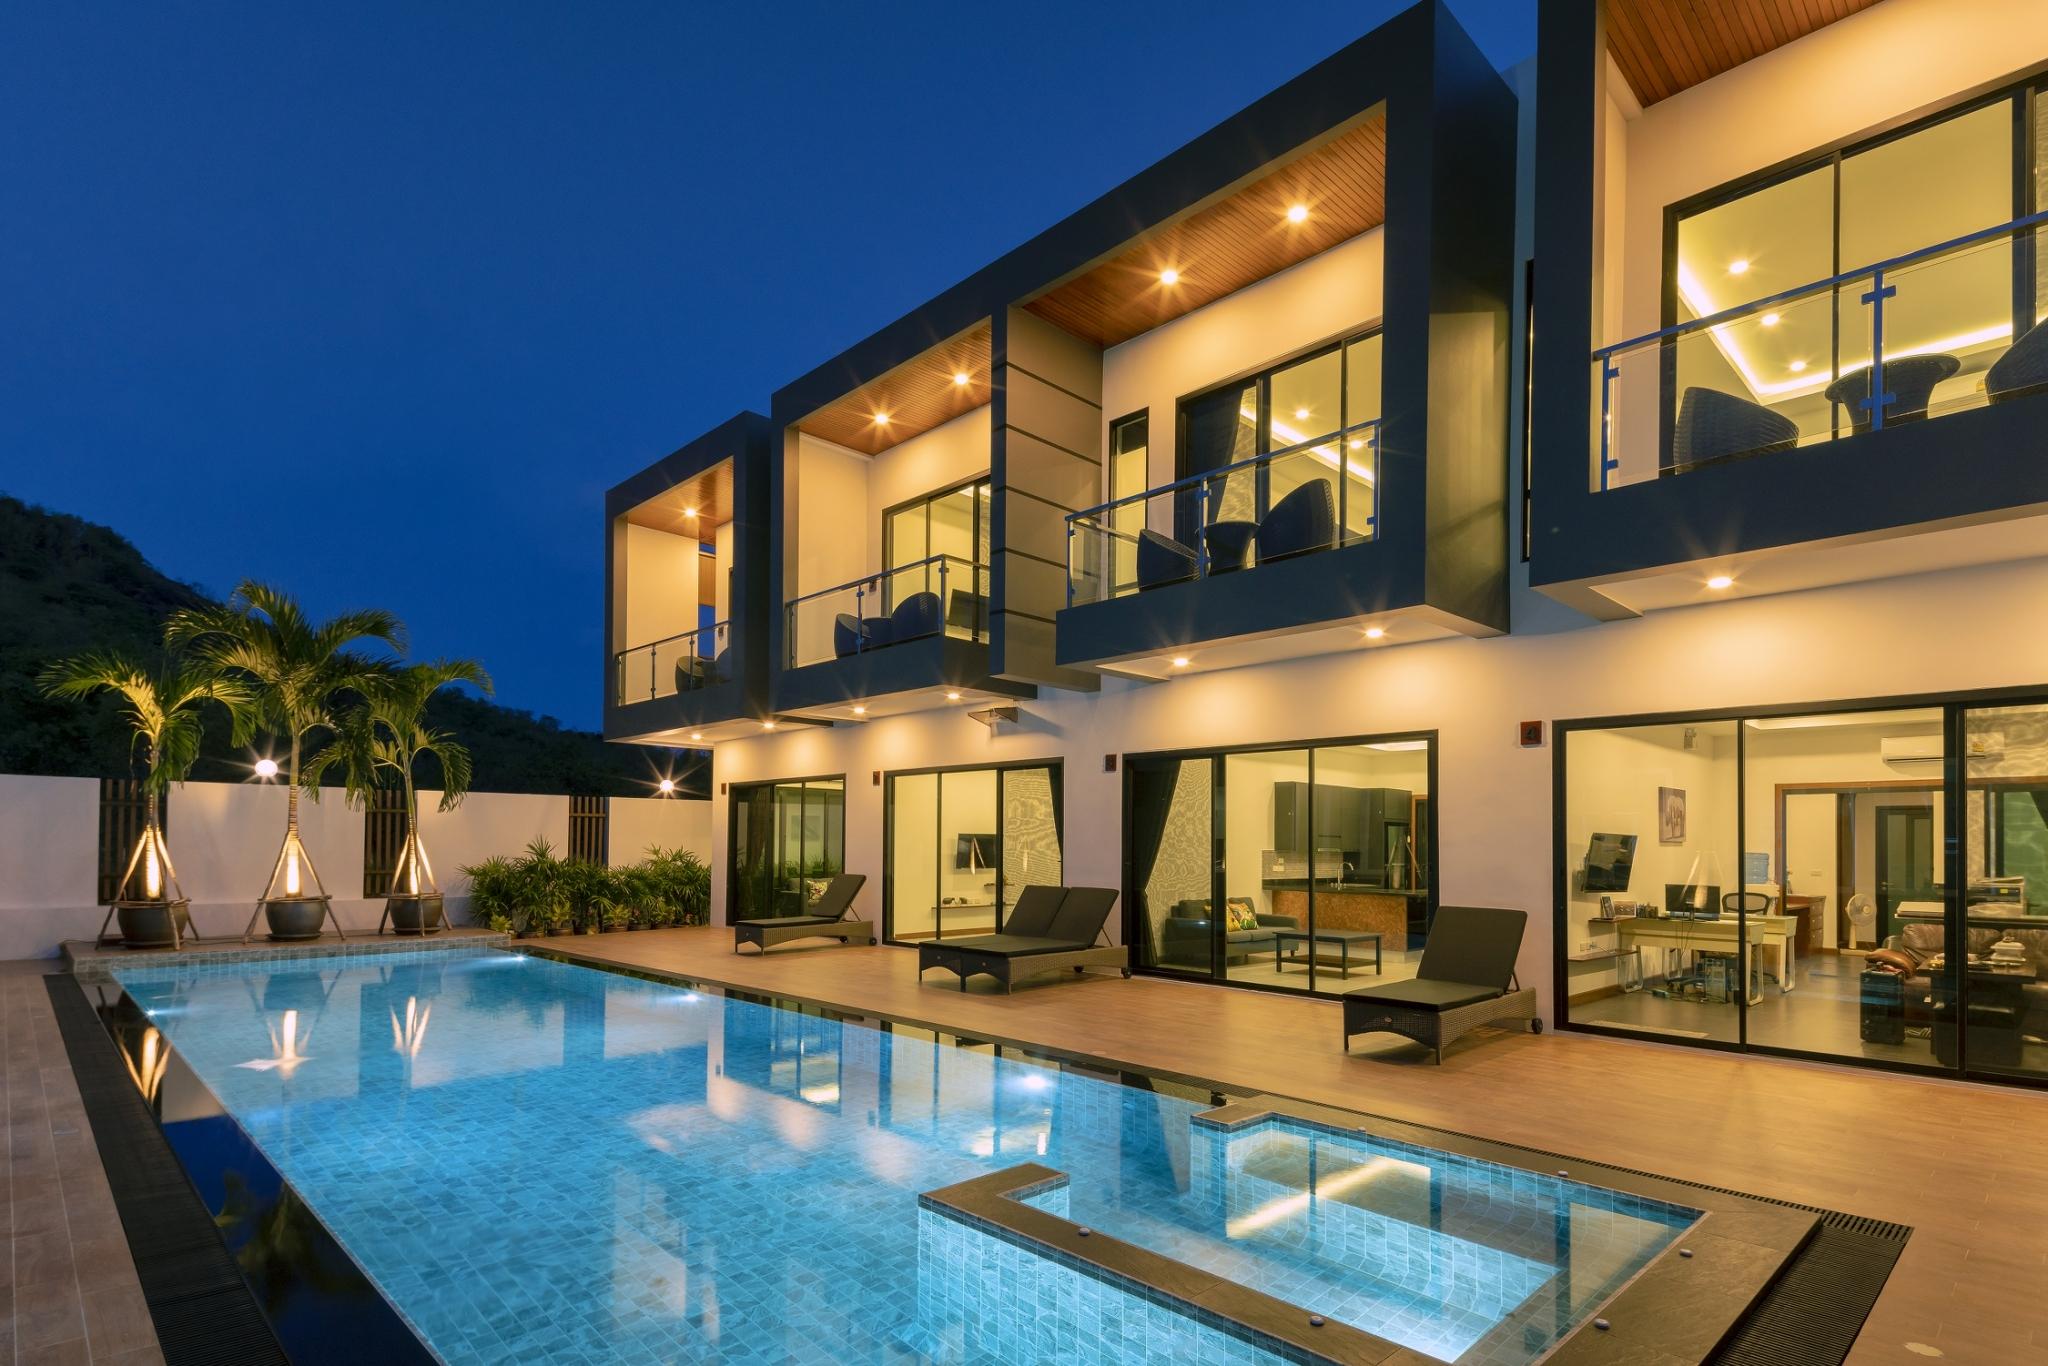 Hillside Hamlet Homes 7 Luxury Apartments for rent